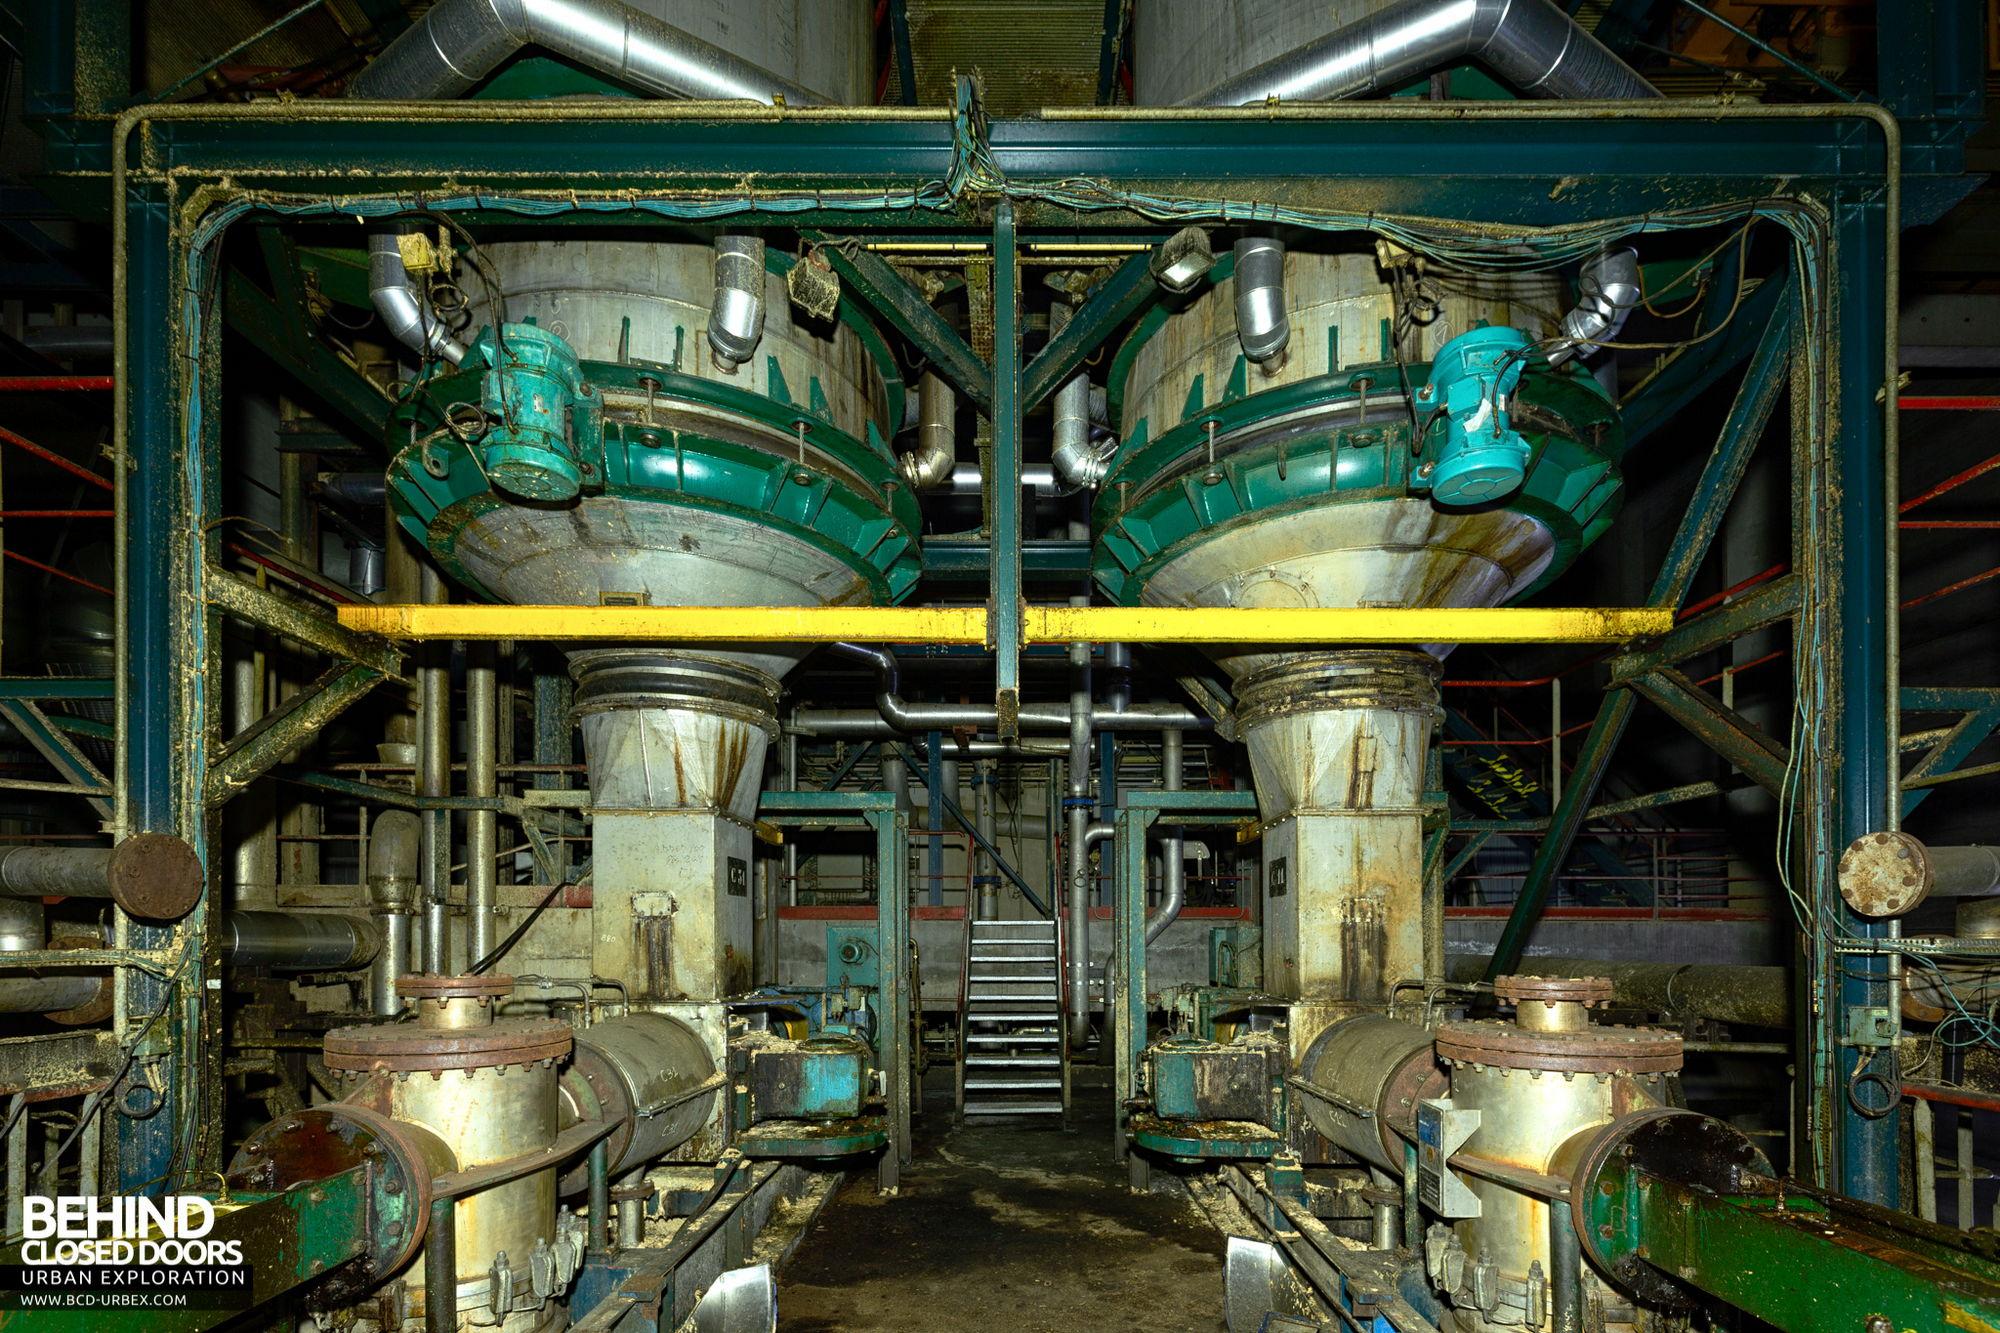 Stora Enso, Corbehem - Pulp refiner machines